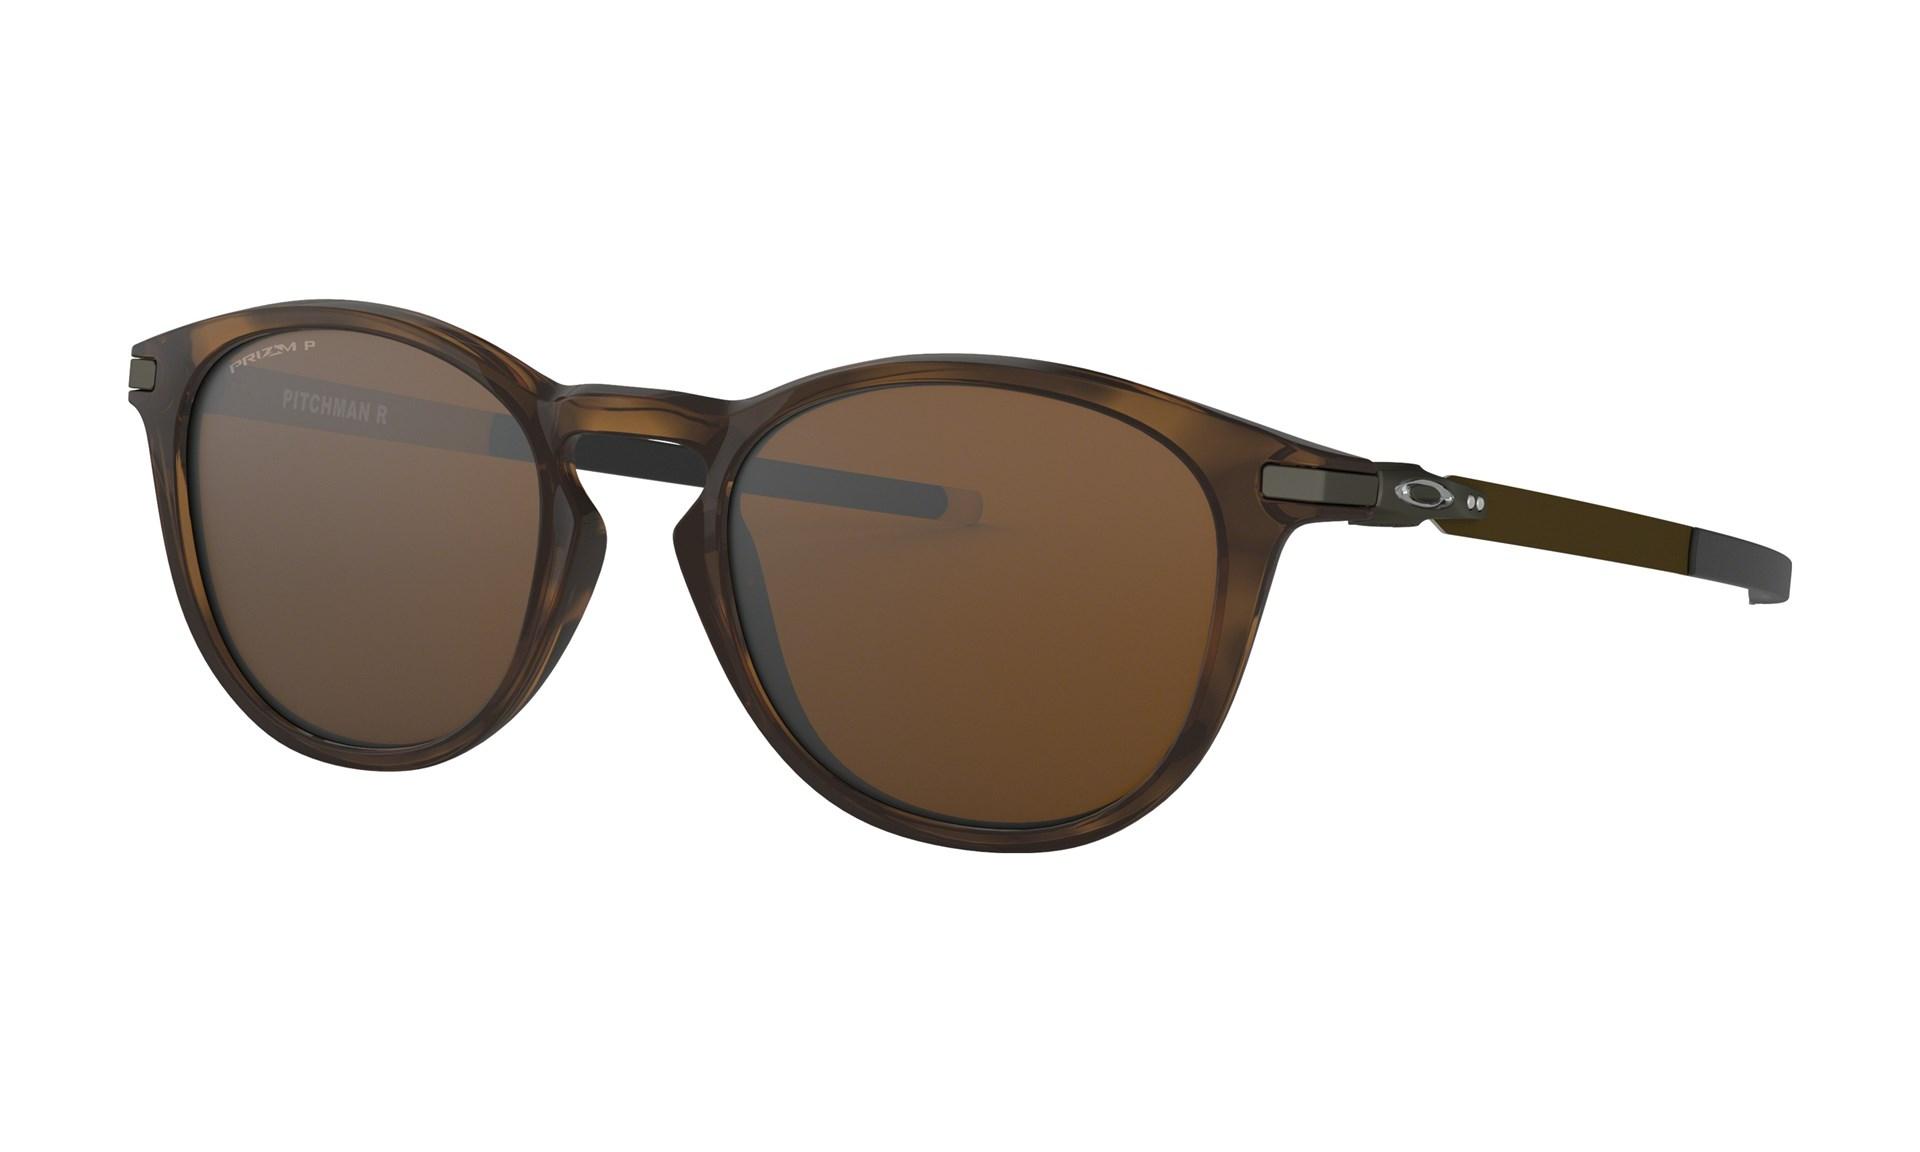 3c84a944eee2 Bilde  Oakley Pitchman R Polished Brown Tortoise w  Prizm Tungsten  Polarized solbriller - Prizm ...